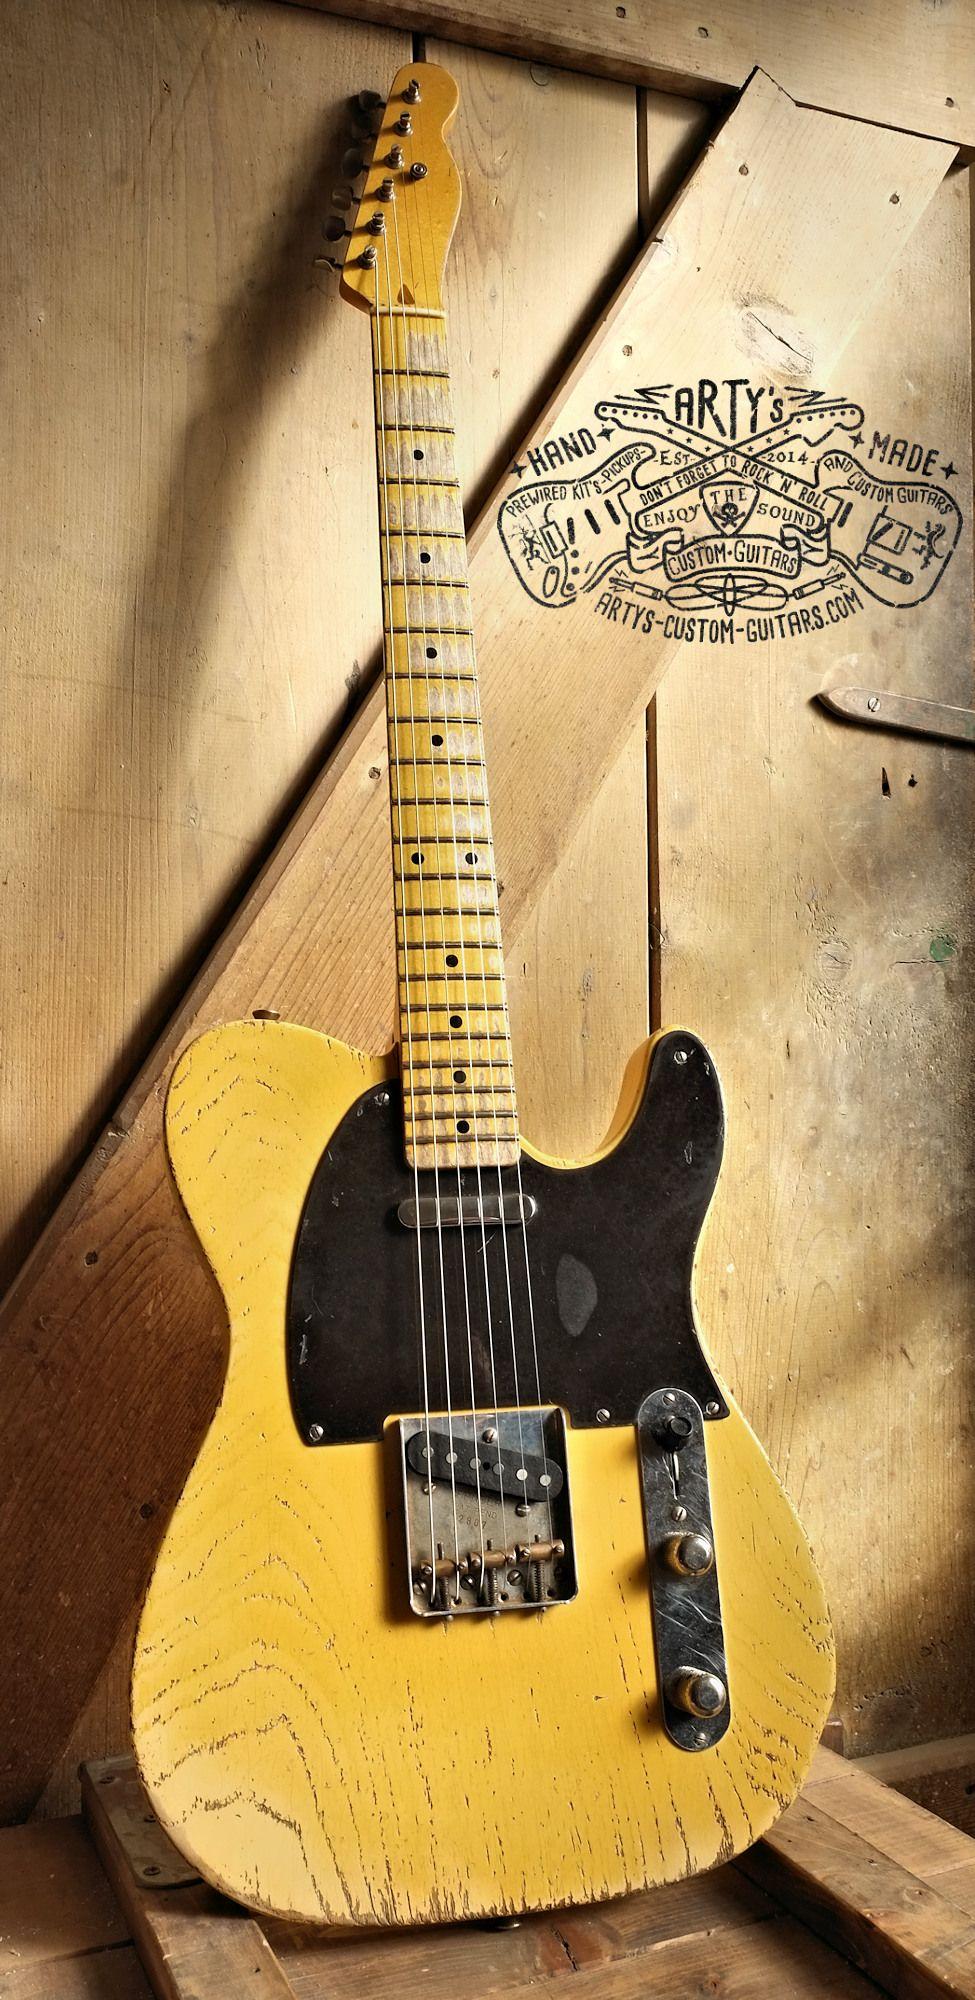 1952 butterscotch blonde blackguard telecaster